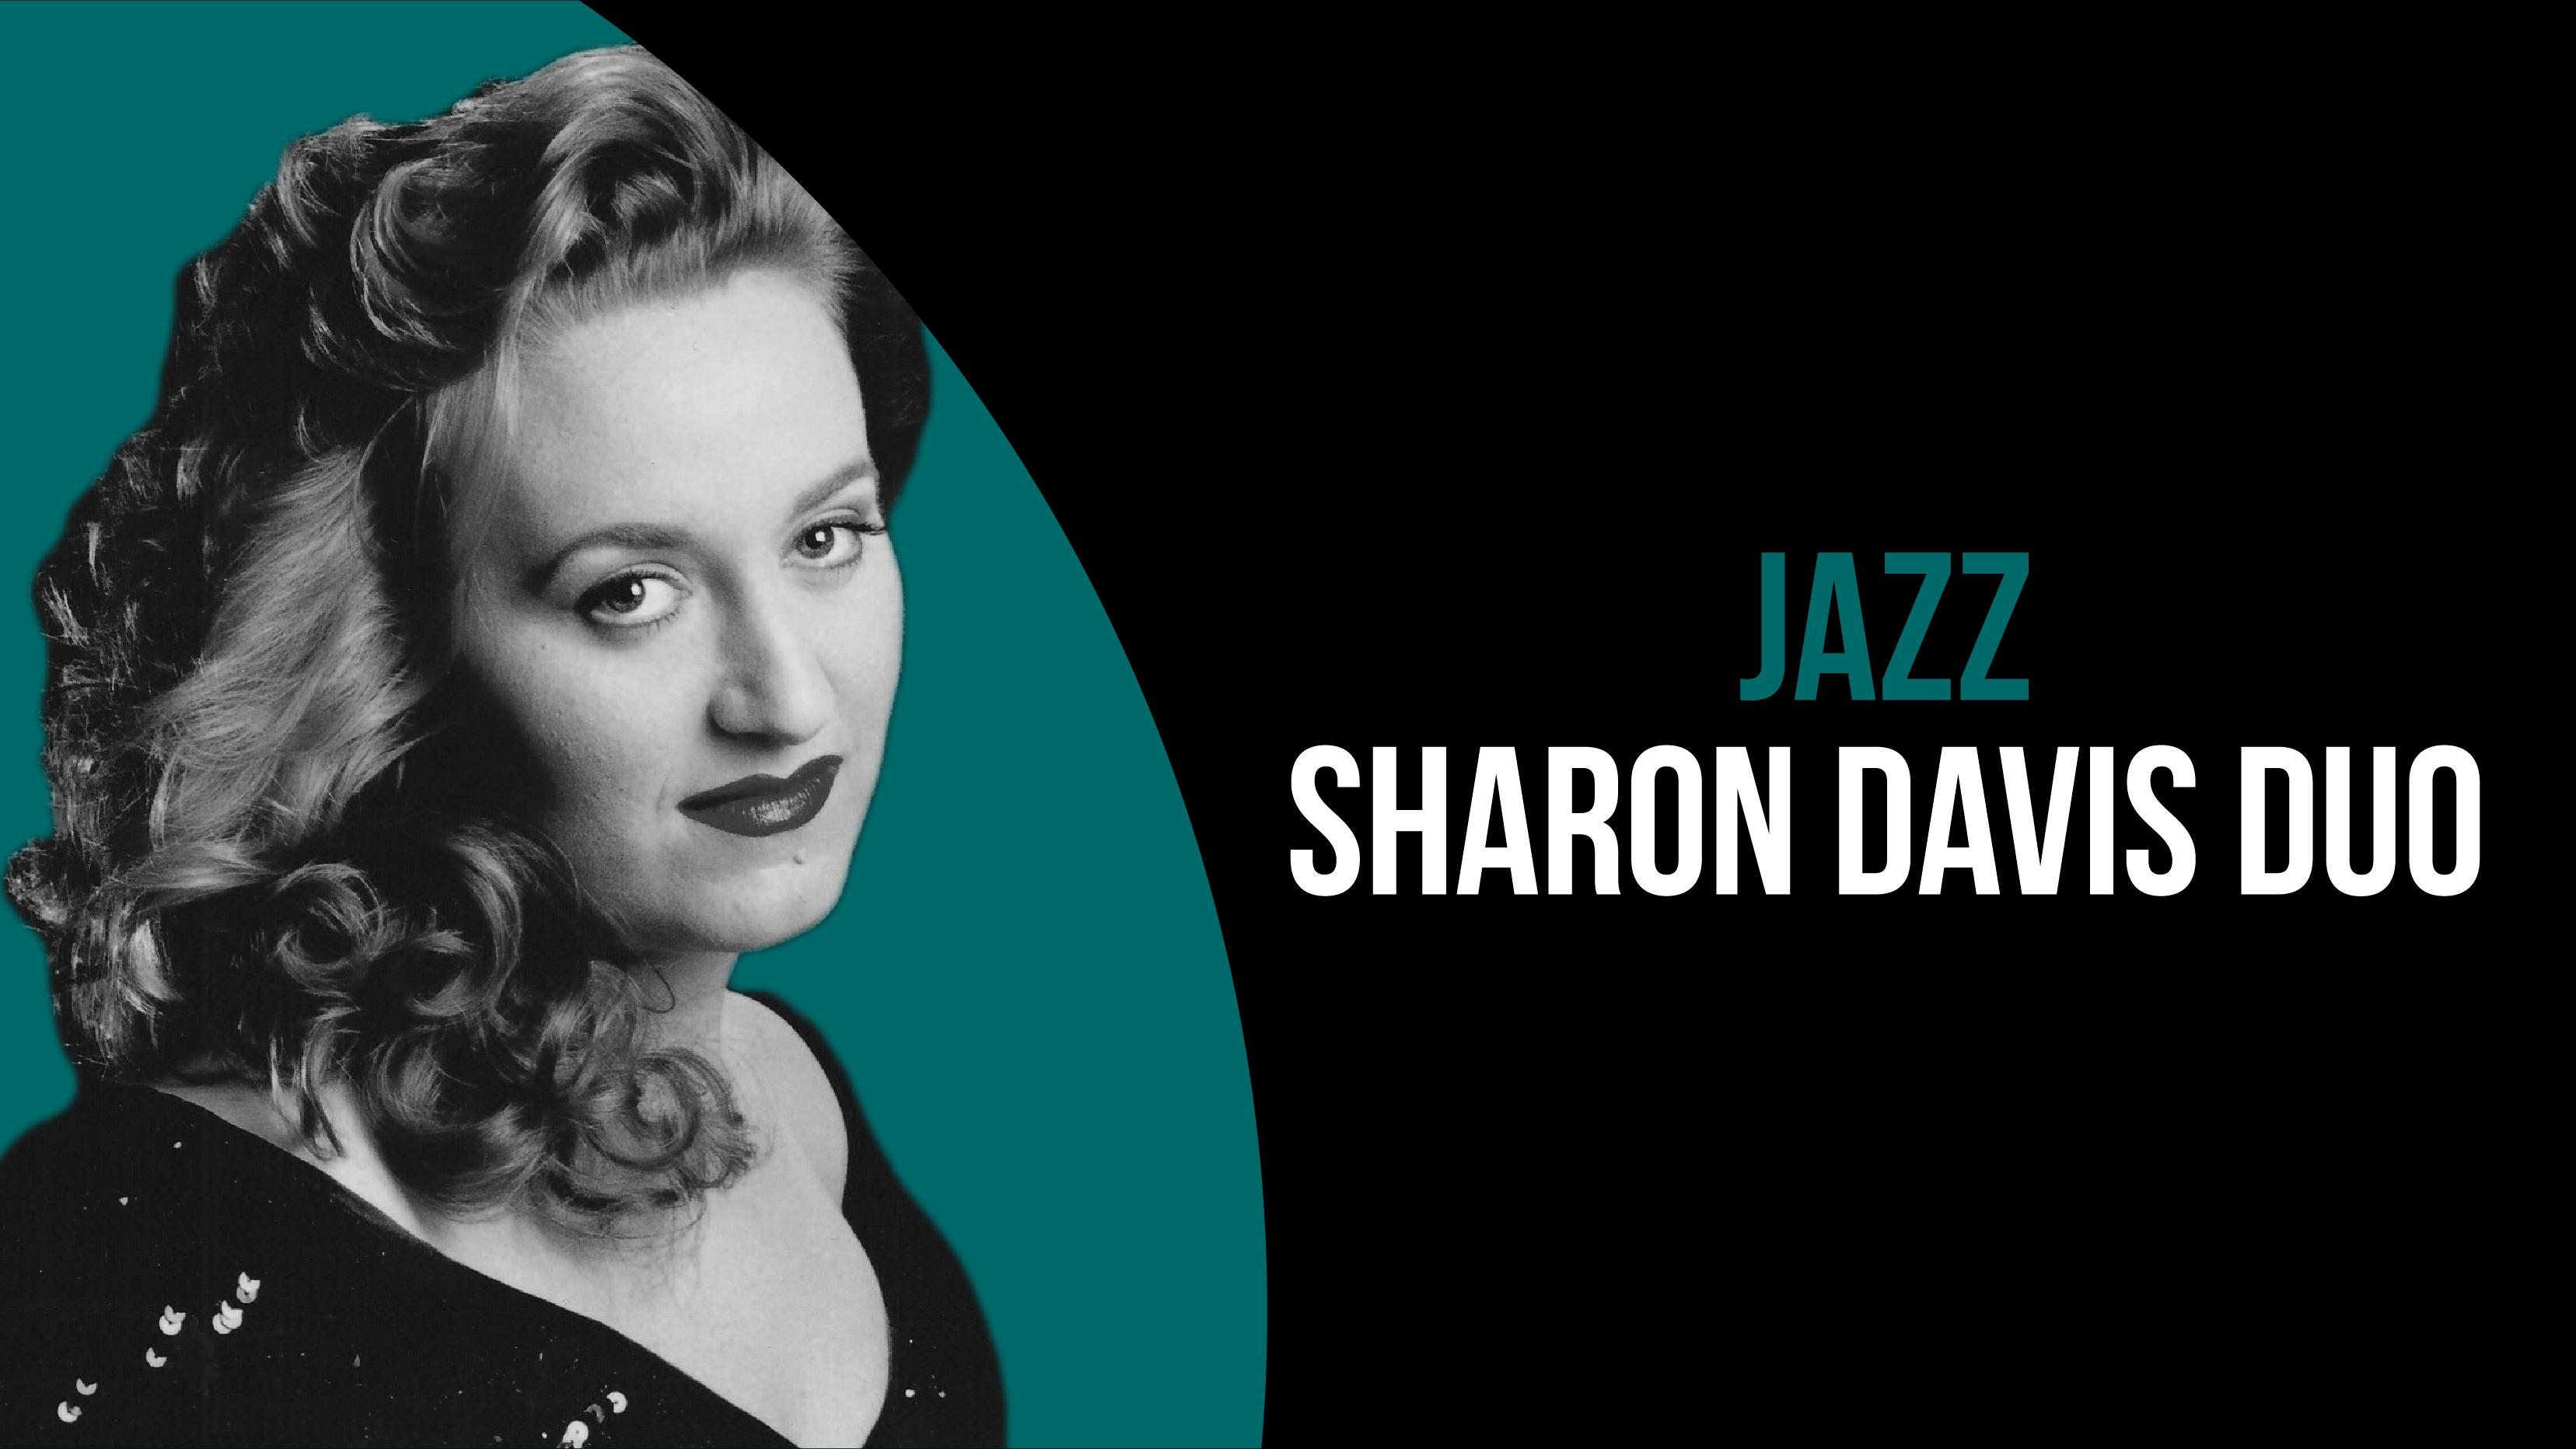 Sharon Davis Duo